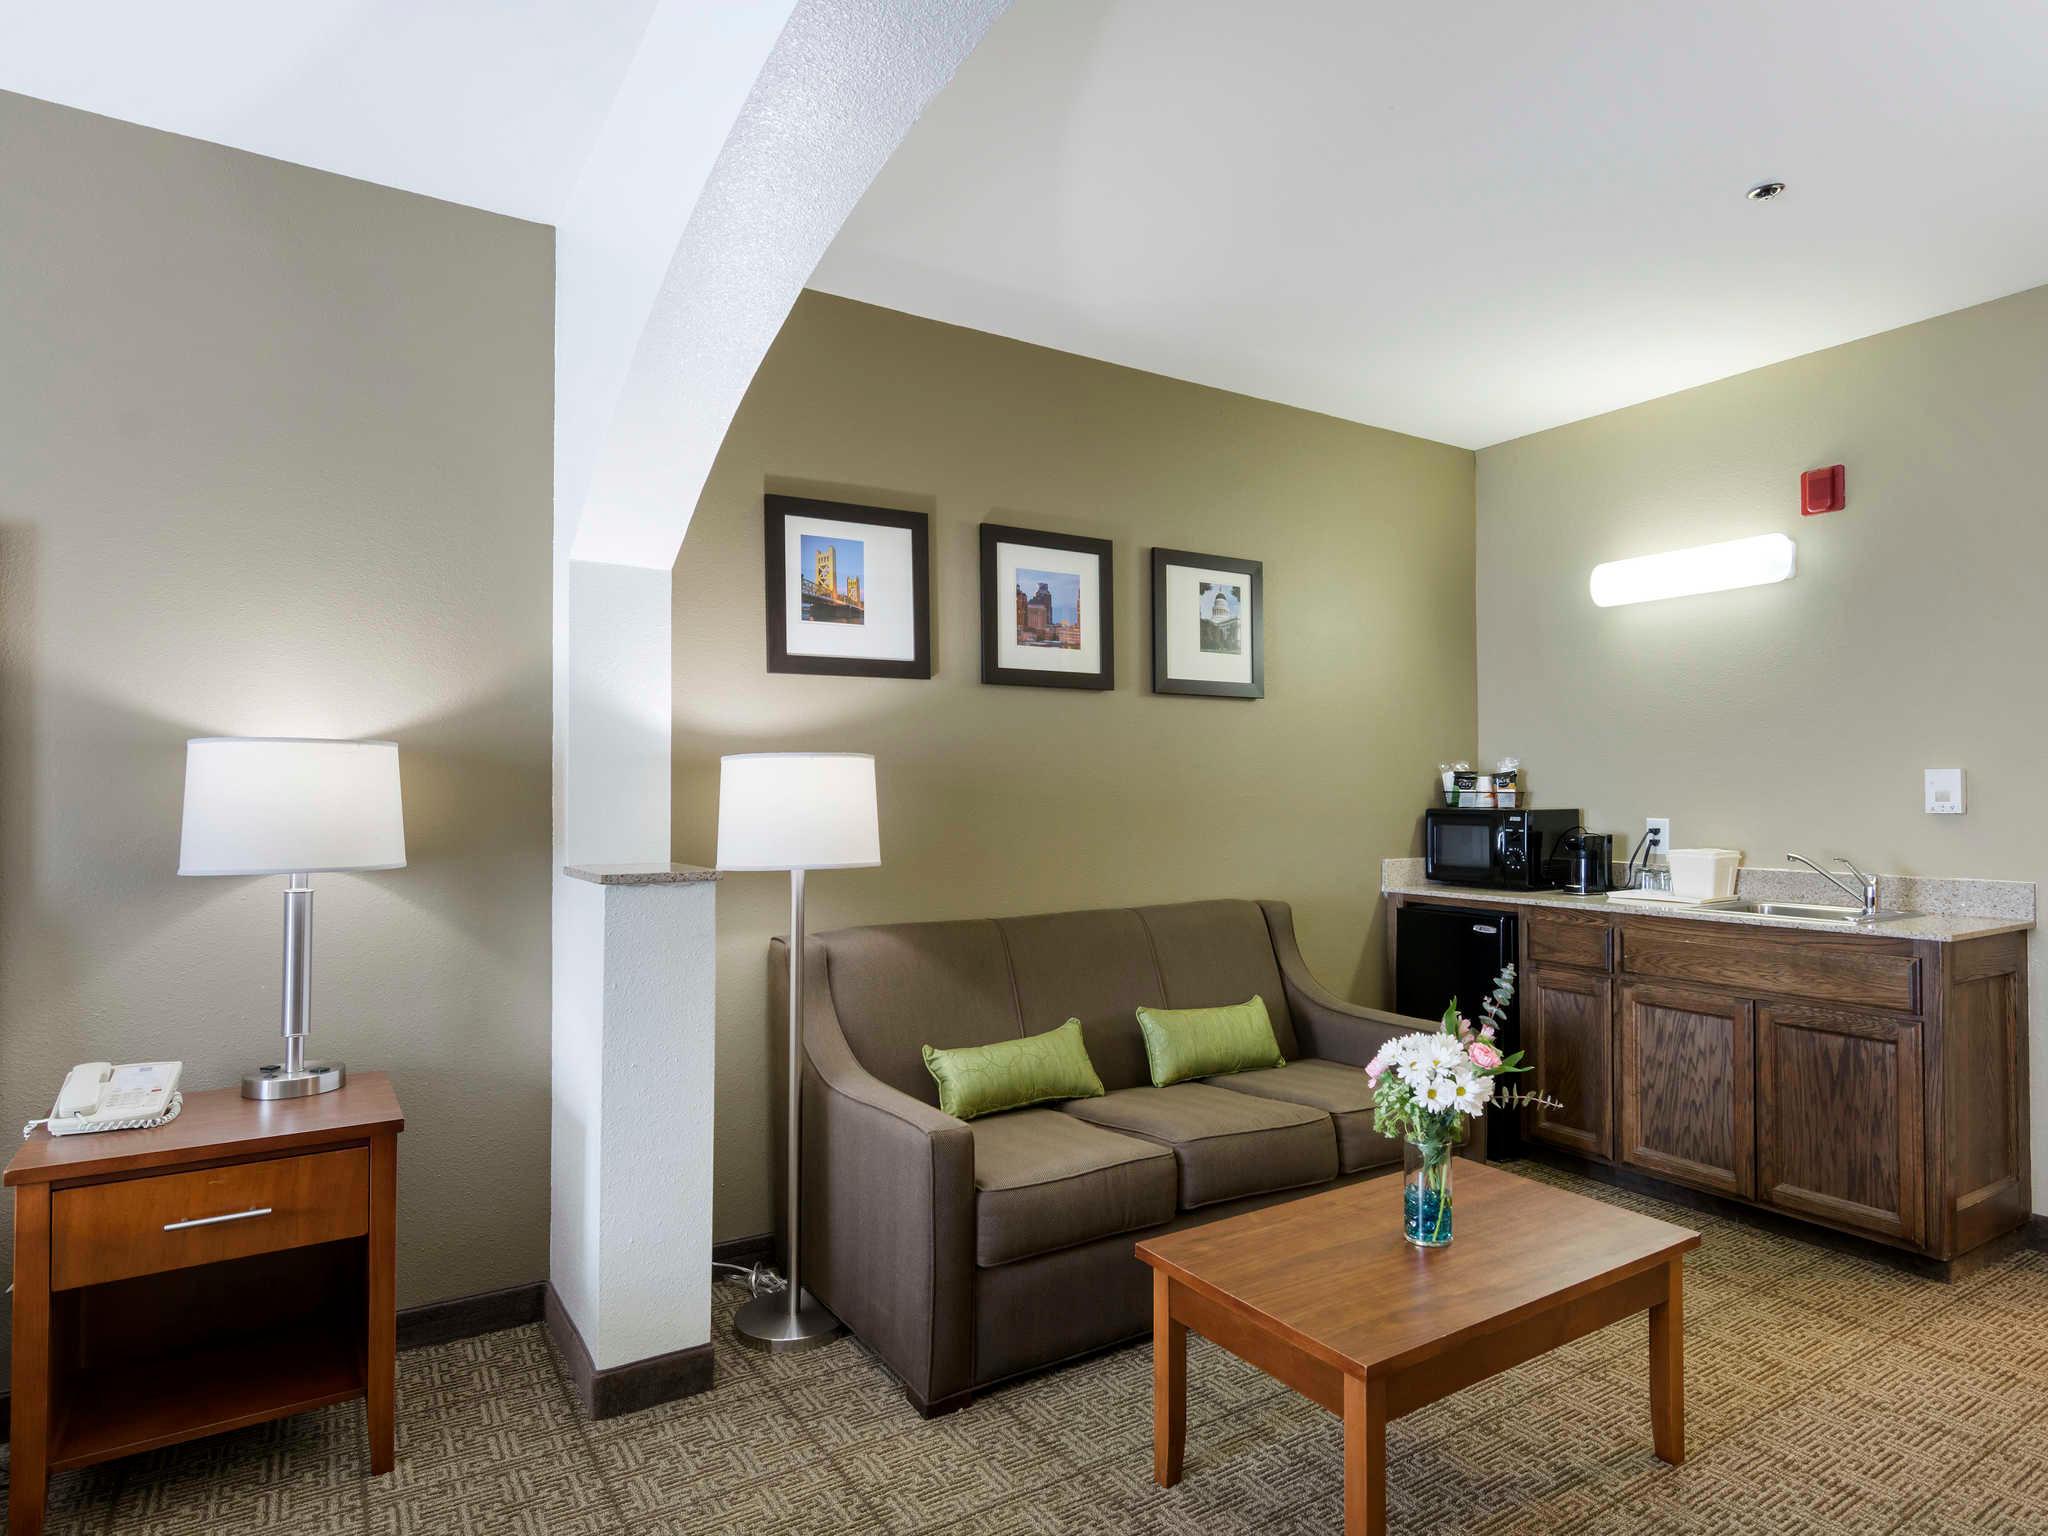 Comfort Inn & Suites Sacramento - University Area image 21